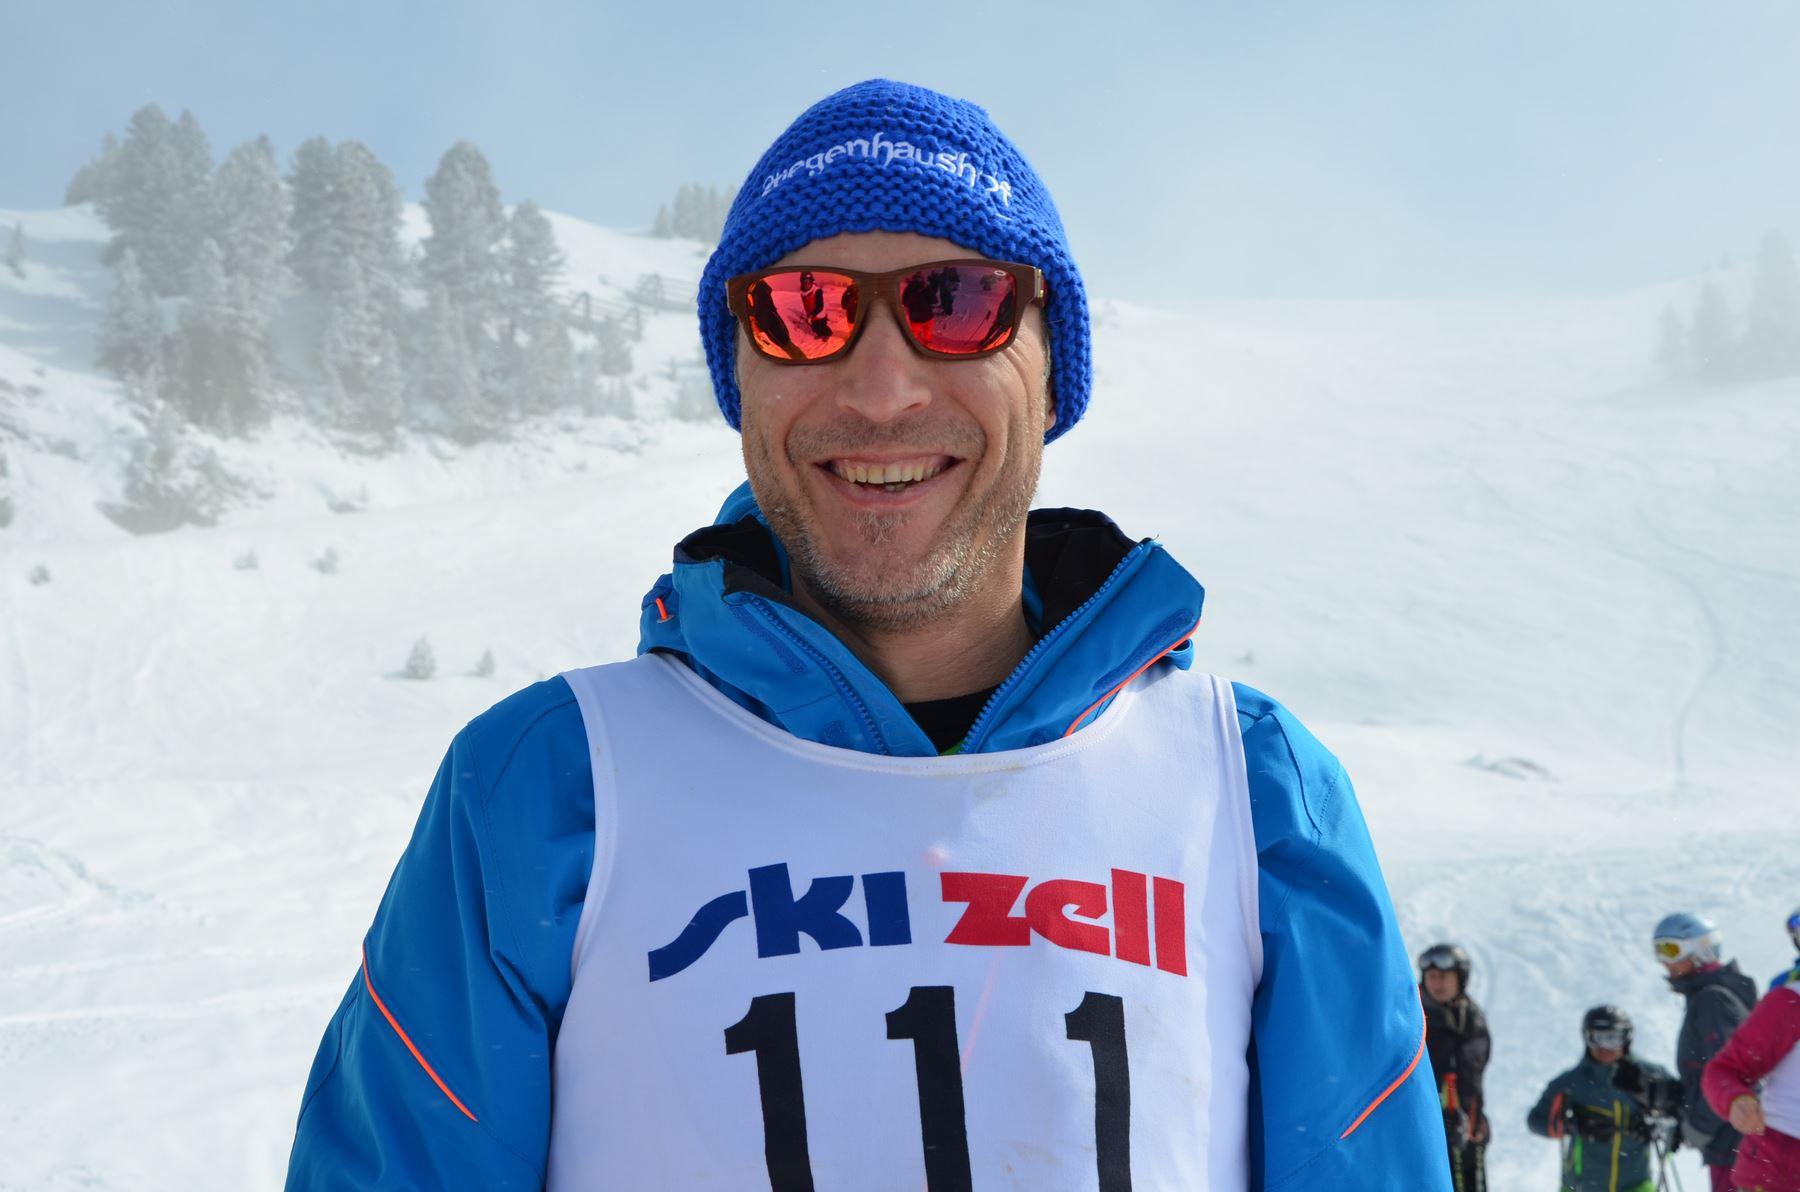 2015-03-22 BV Zillertal Skirennen 068.JPG